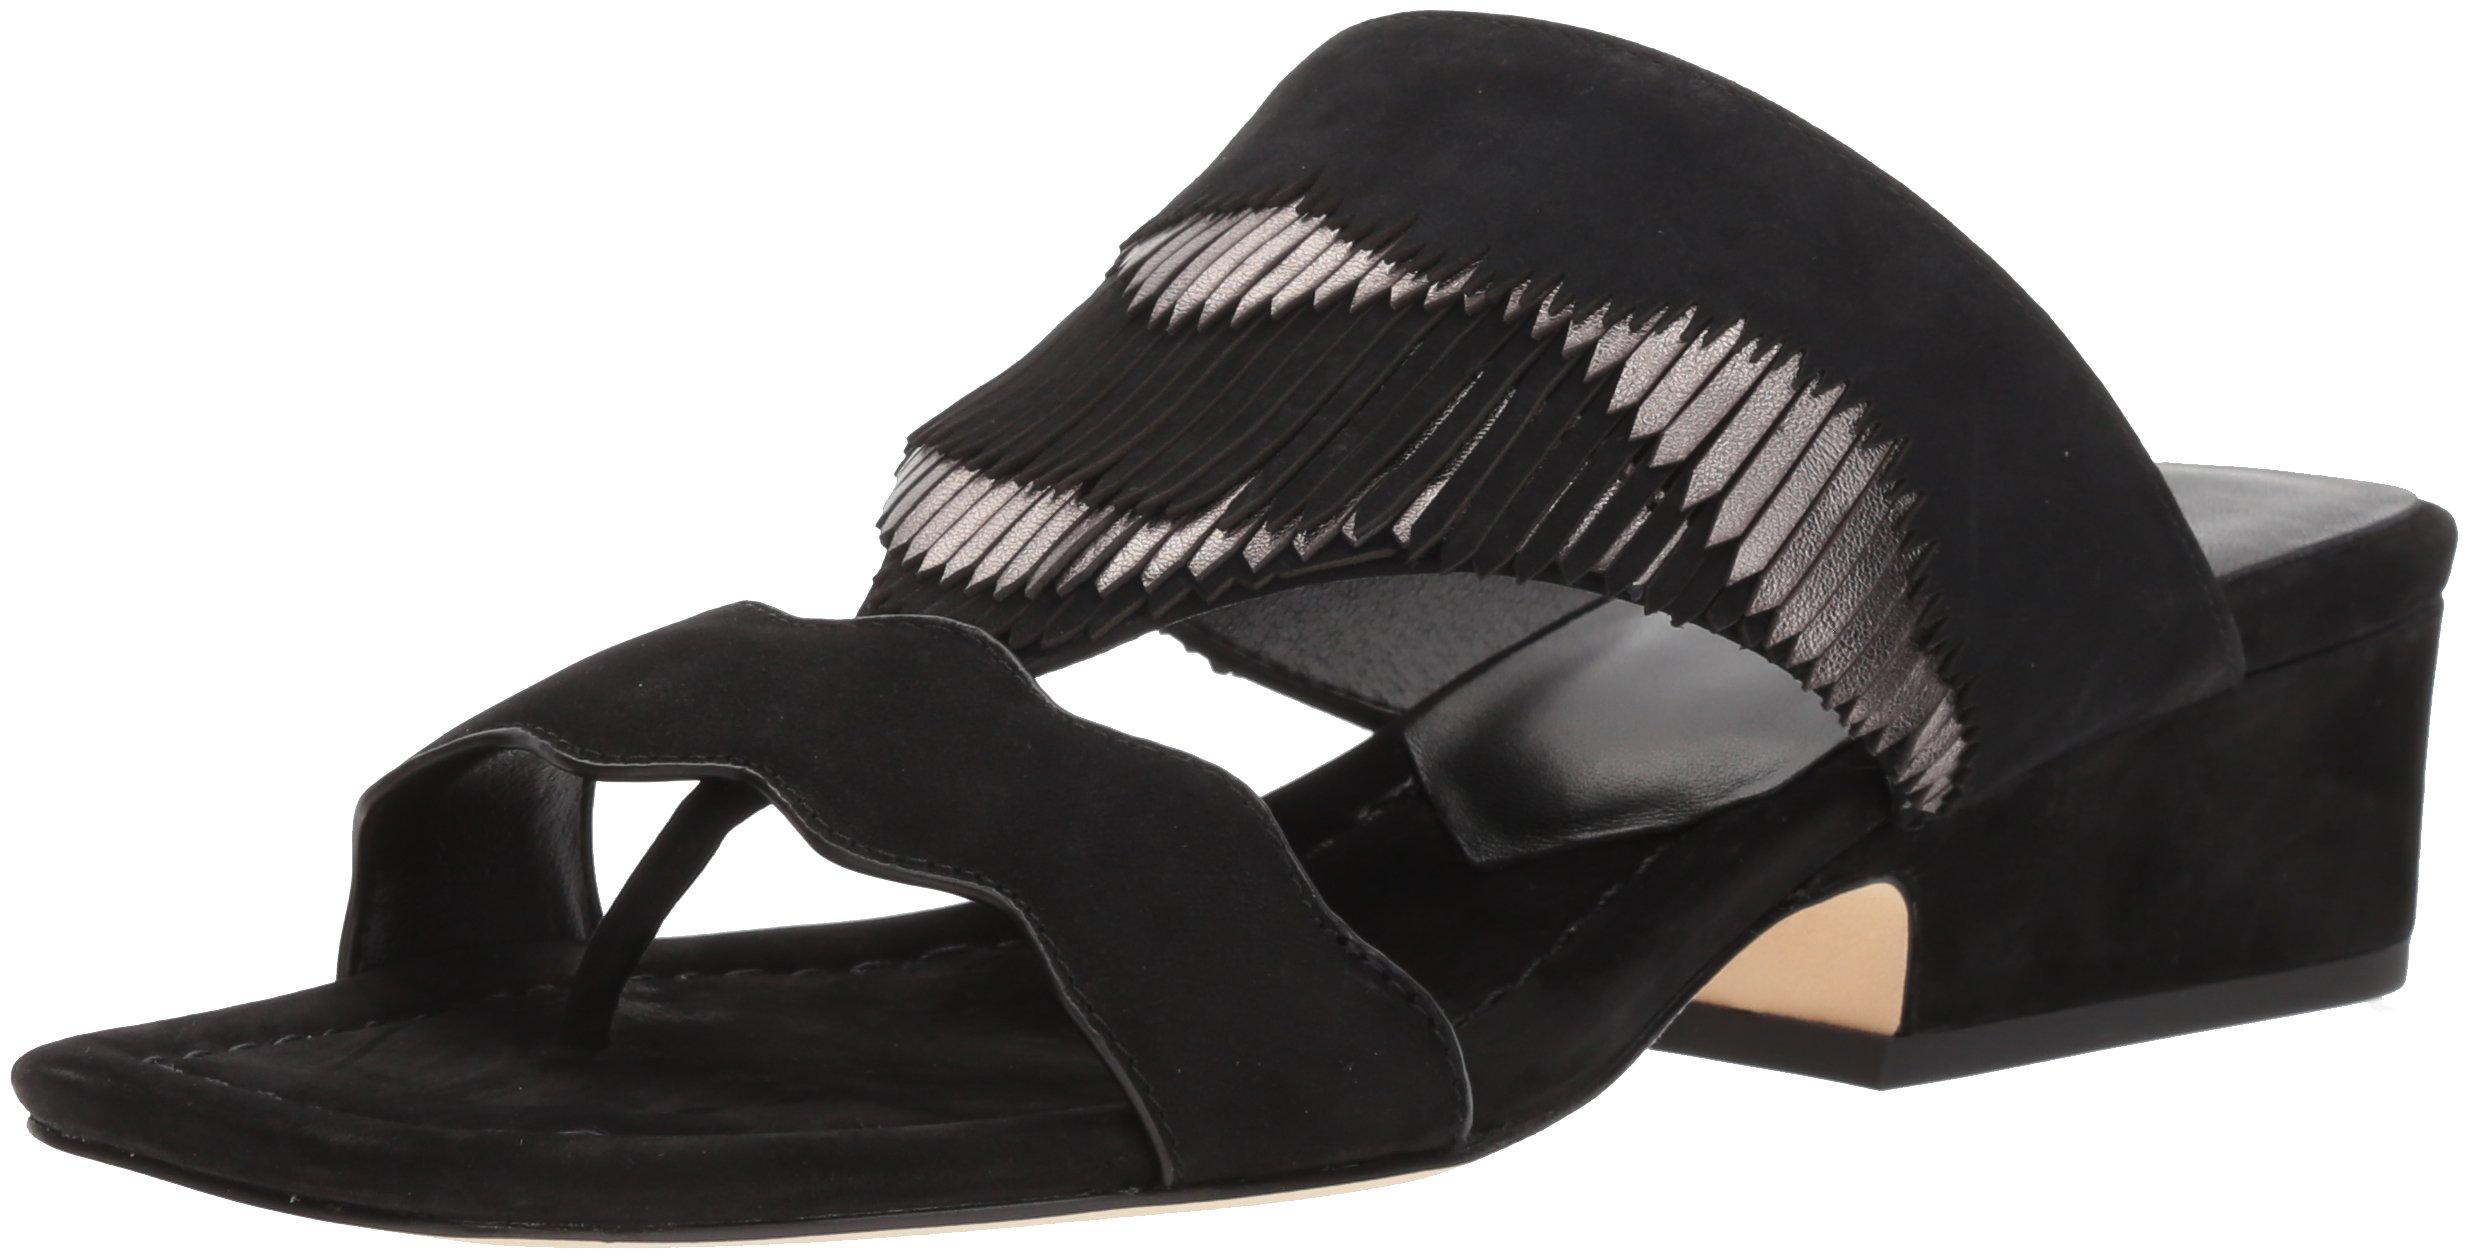 Donald J Pliner Women's Darcie Slide Sandal, Black, 6.5 Medium US